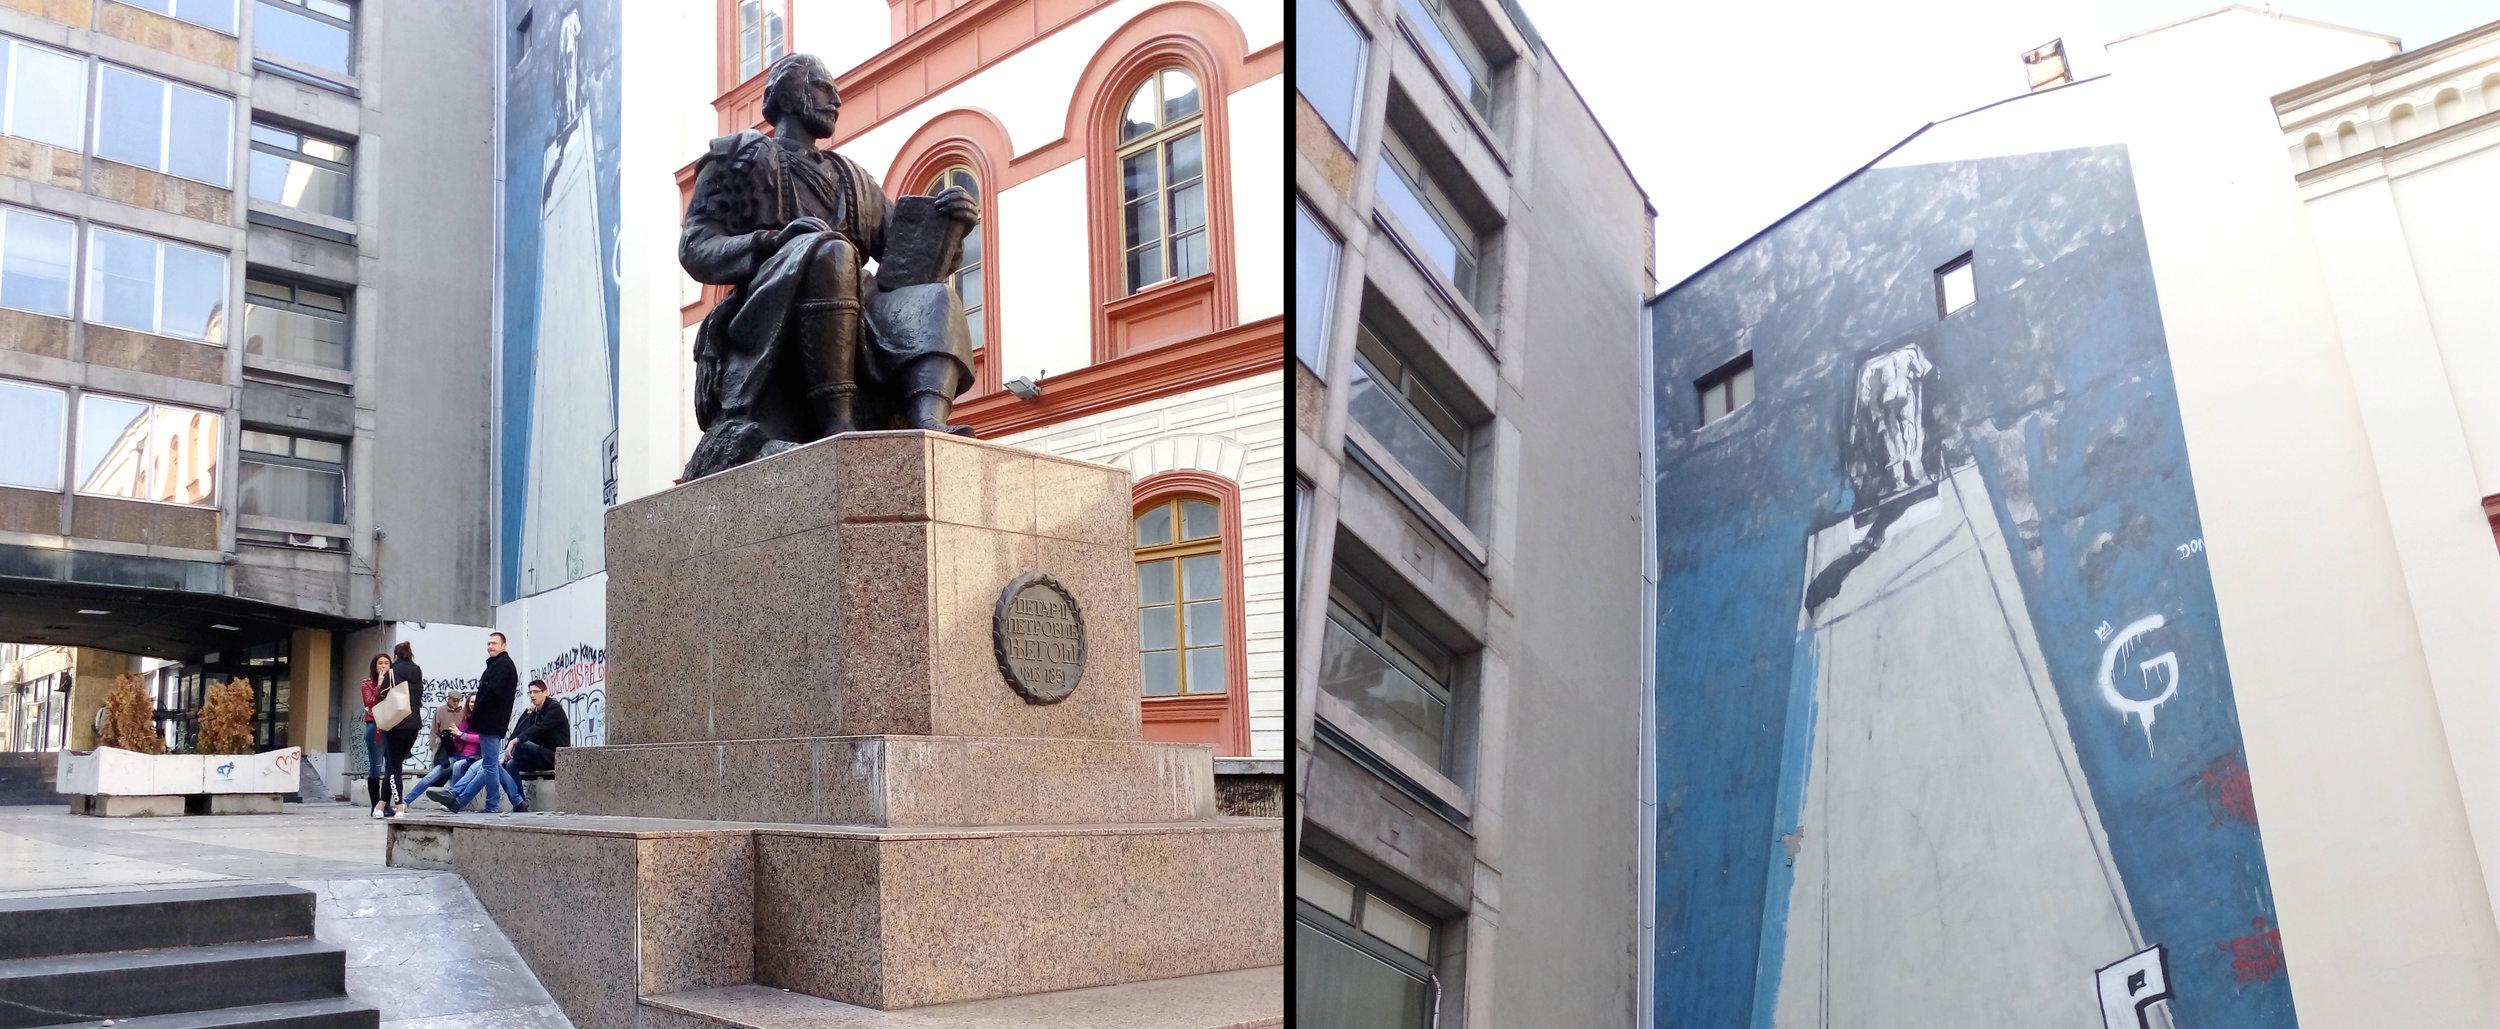 Sculpture of Petar Petrovič, 19th century philosopher & poet alongside a modern mural, central Belgrade